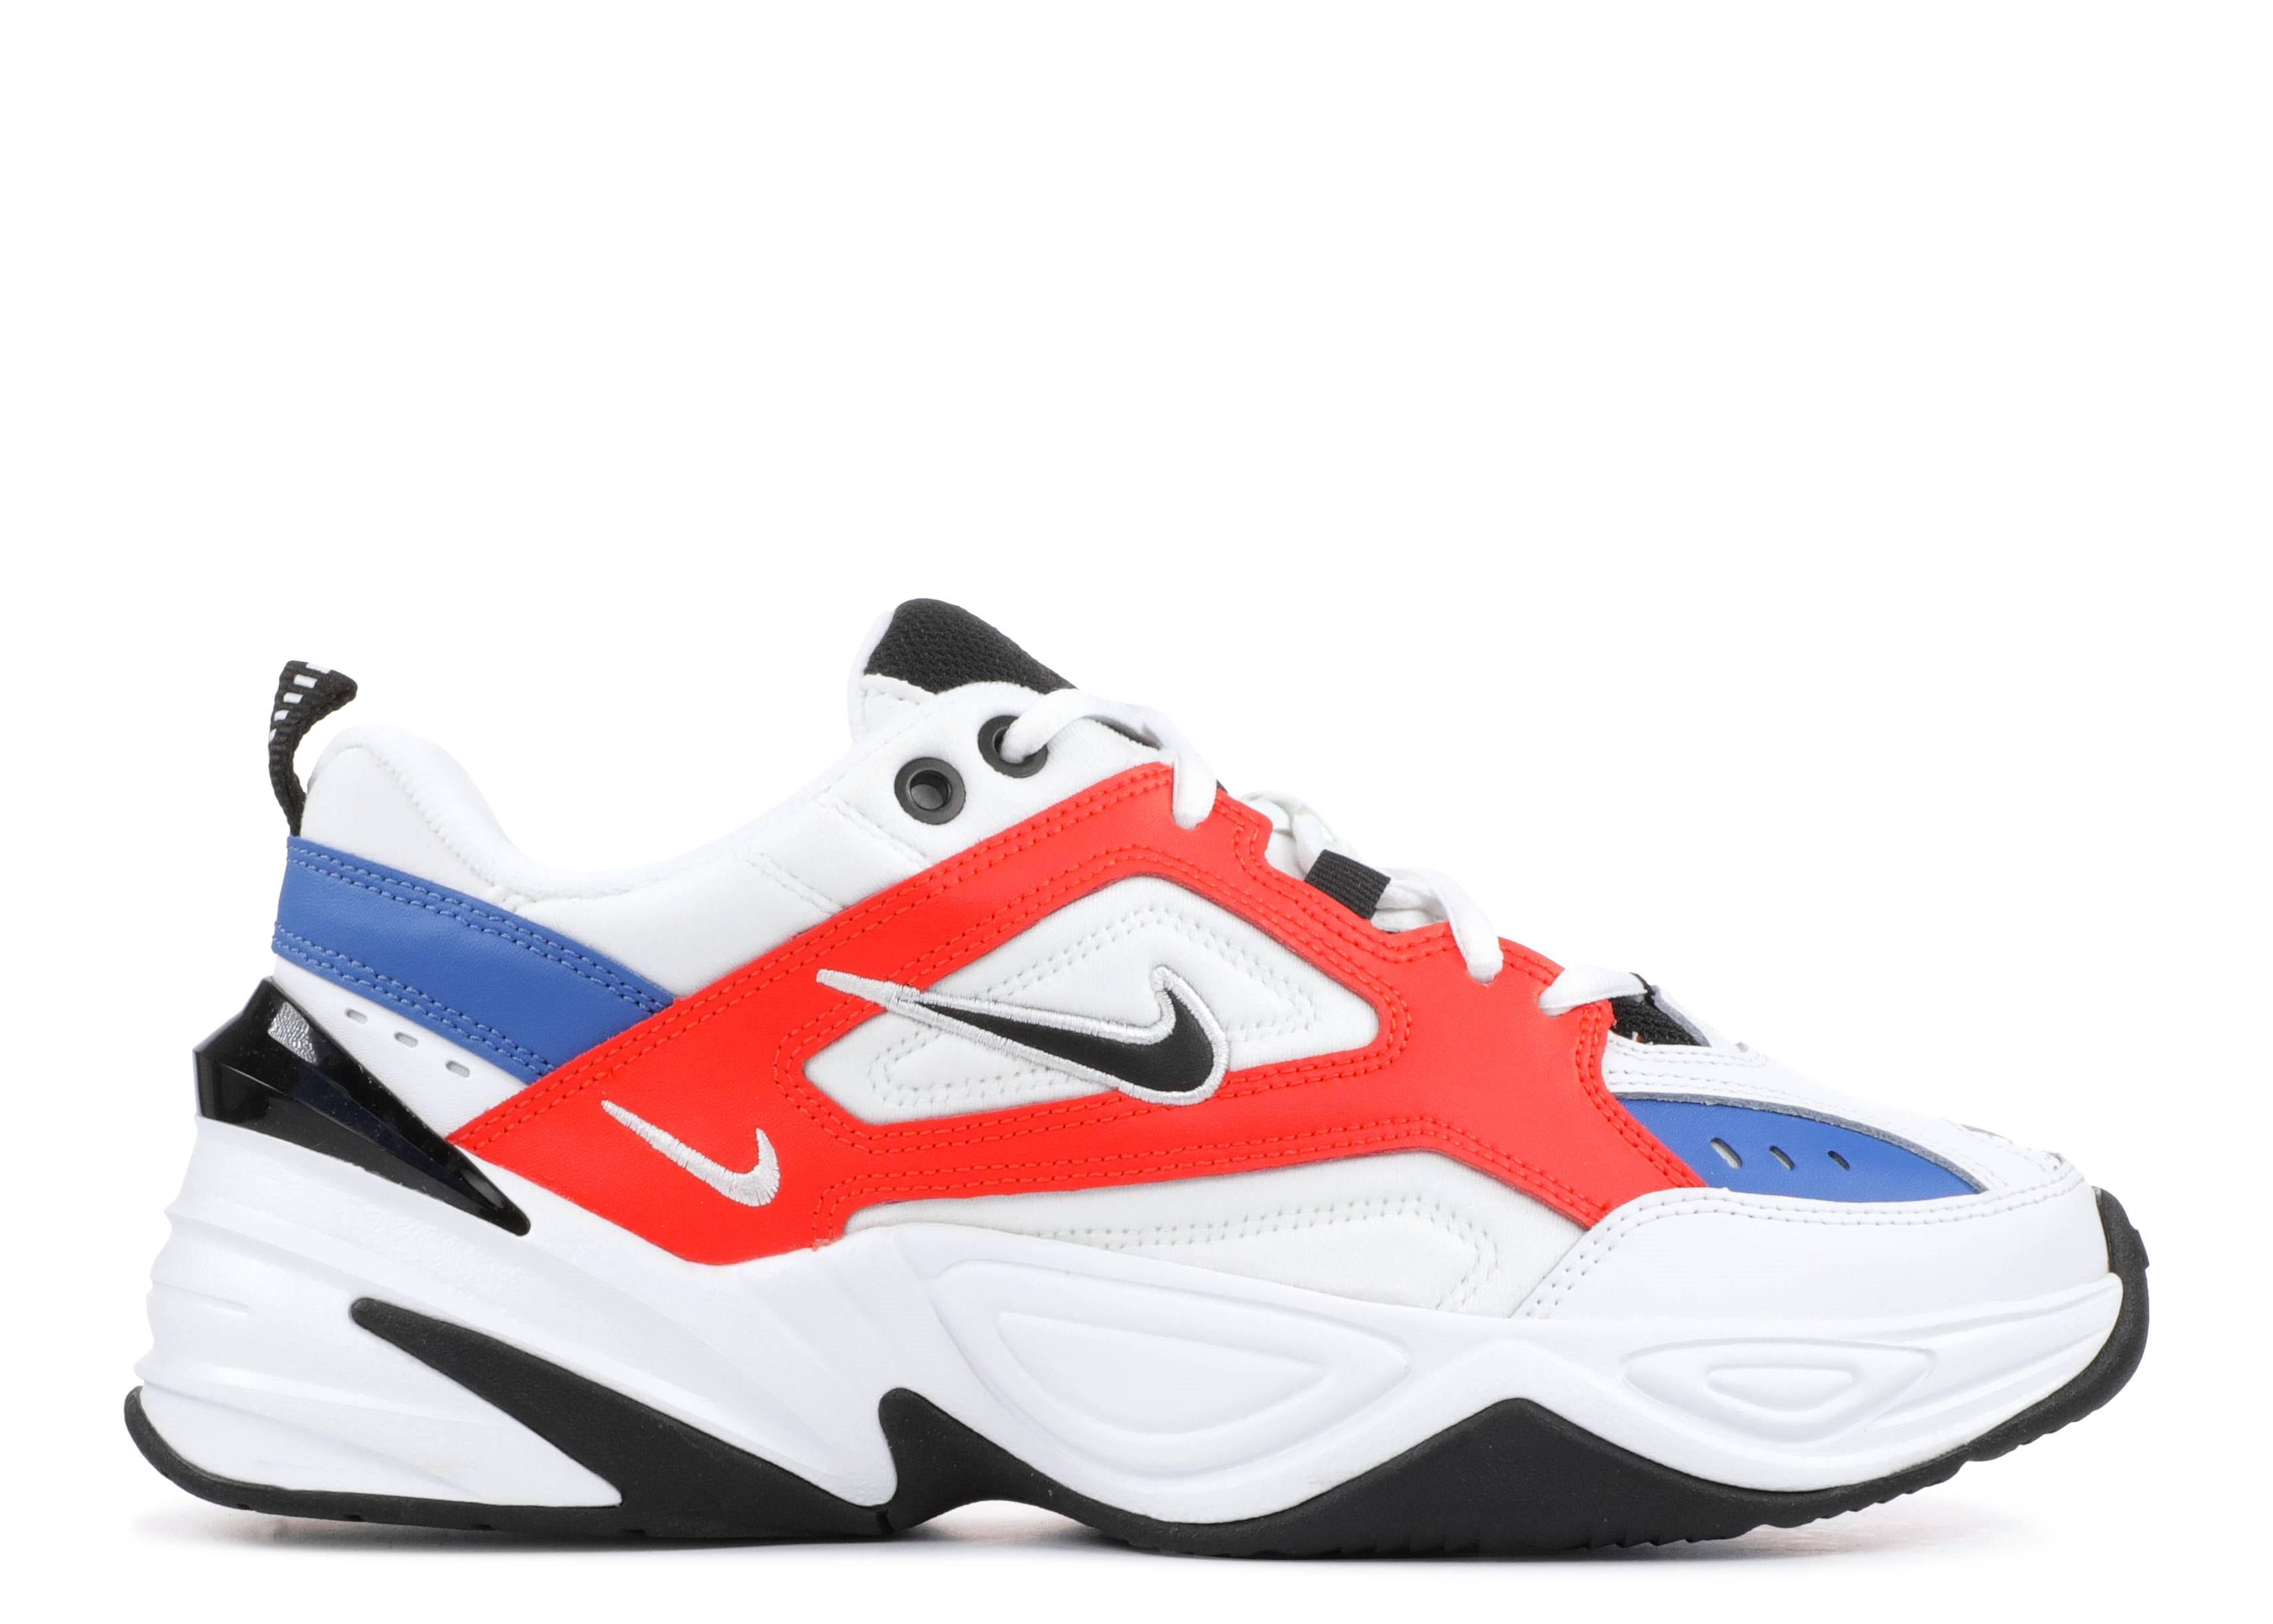 Misterio Organo Críticamente  W Nike M2k Tekno 'john Elliott' - Nike - AO3108 101 - summit  white/black-team orange | Flight Club